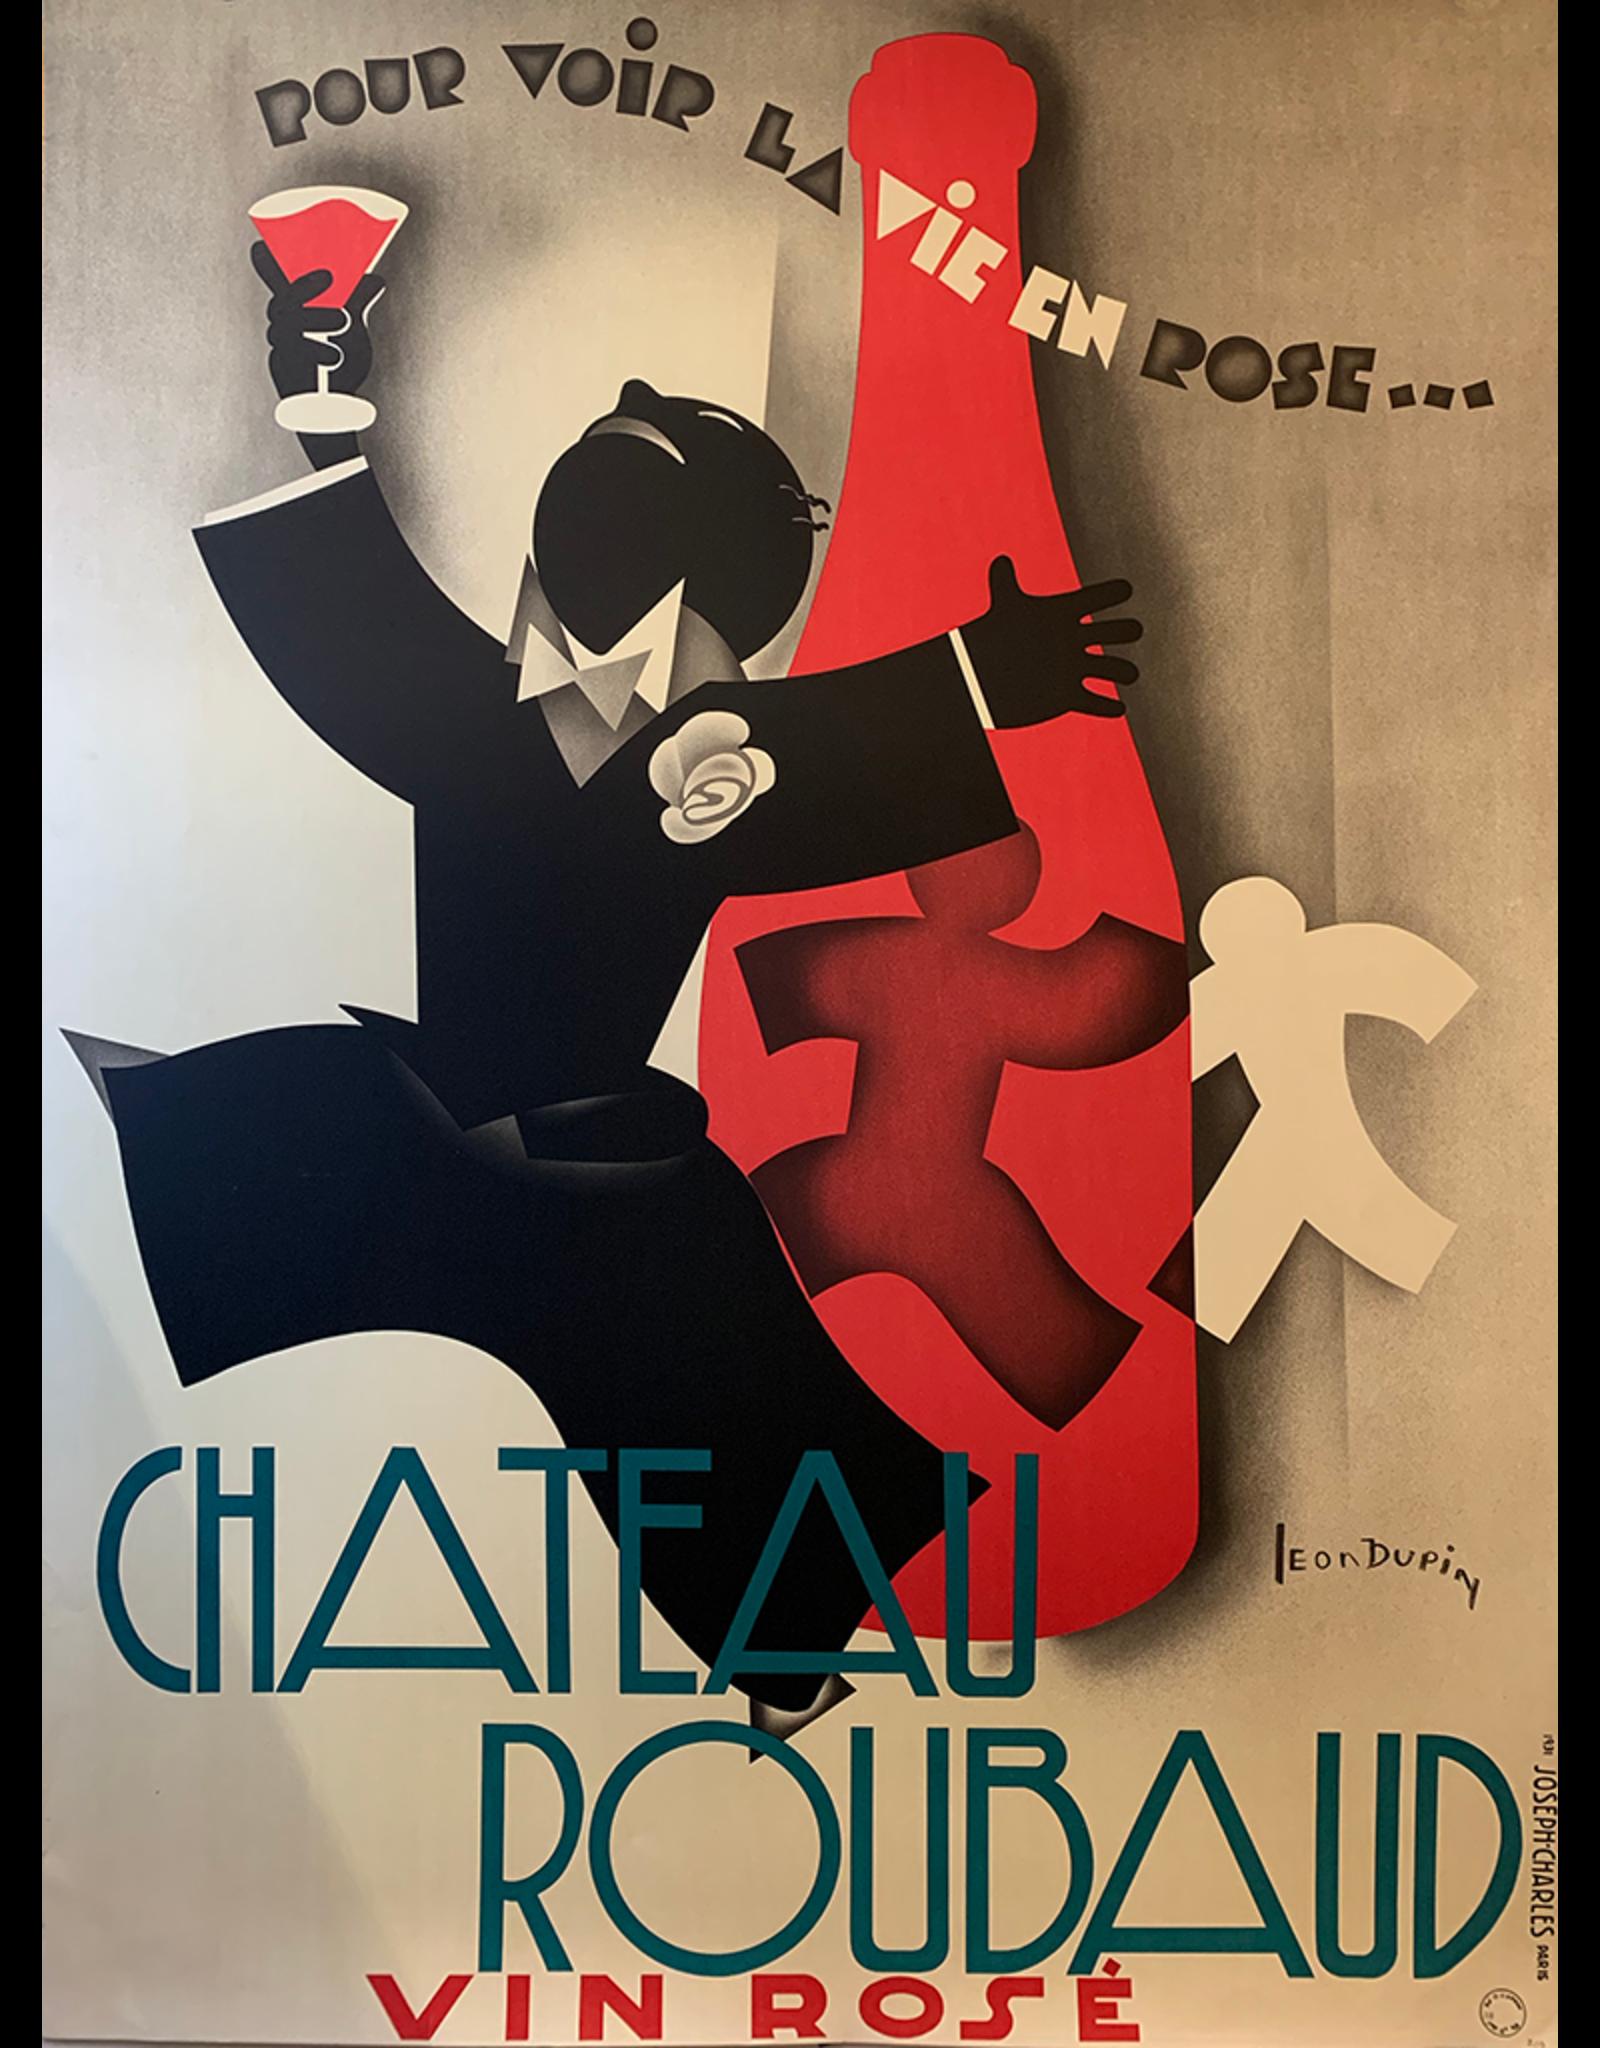 SPV Chateau Roubaud